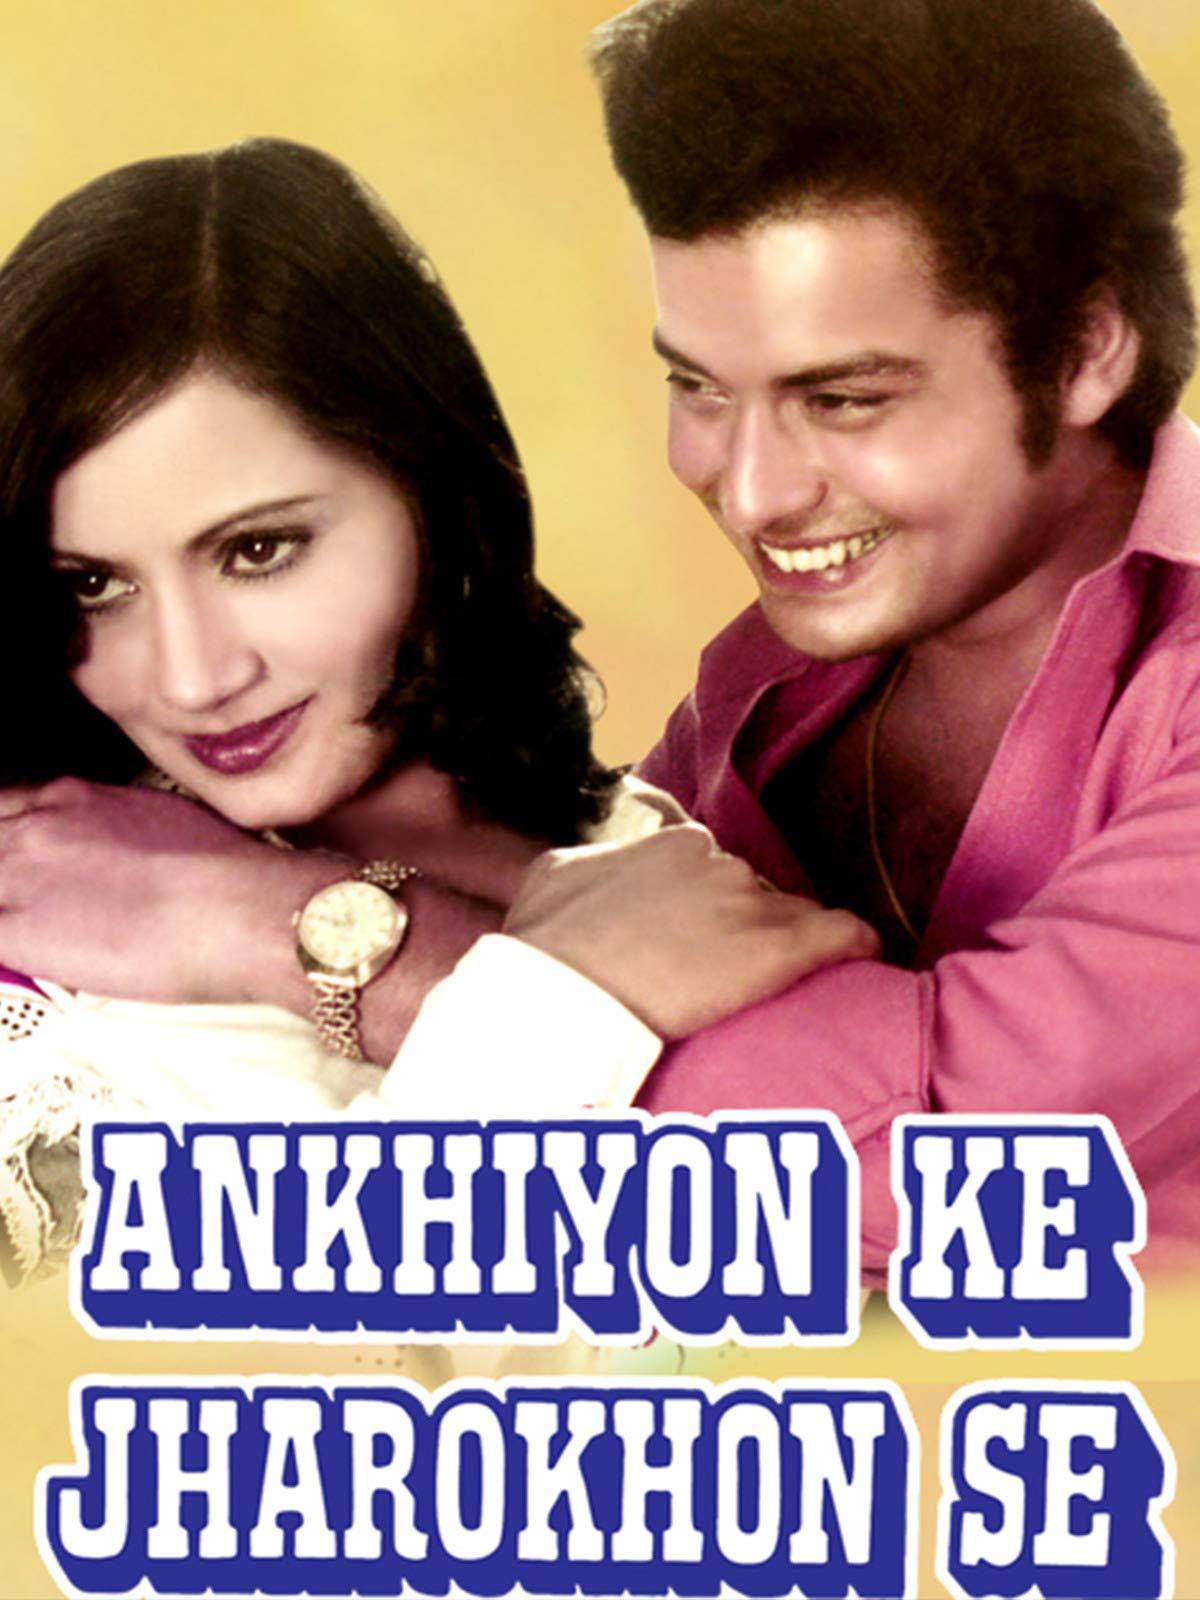 ankhiyon ke jharokhon se movie songs free download